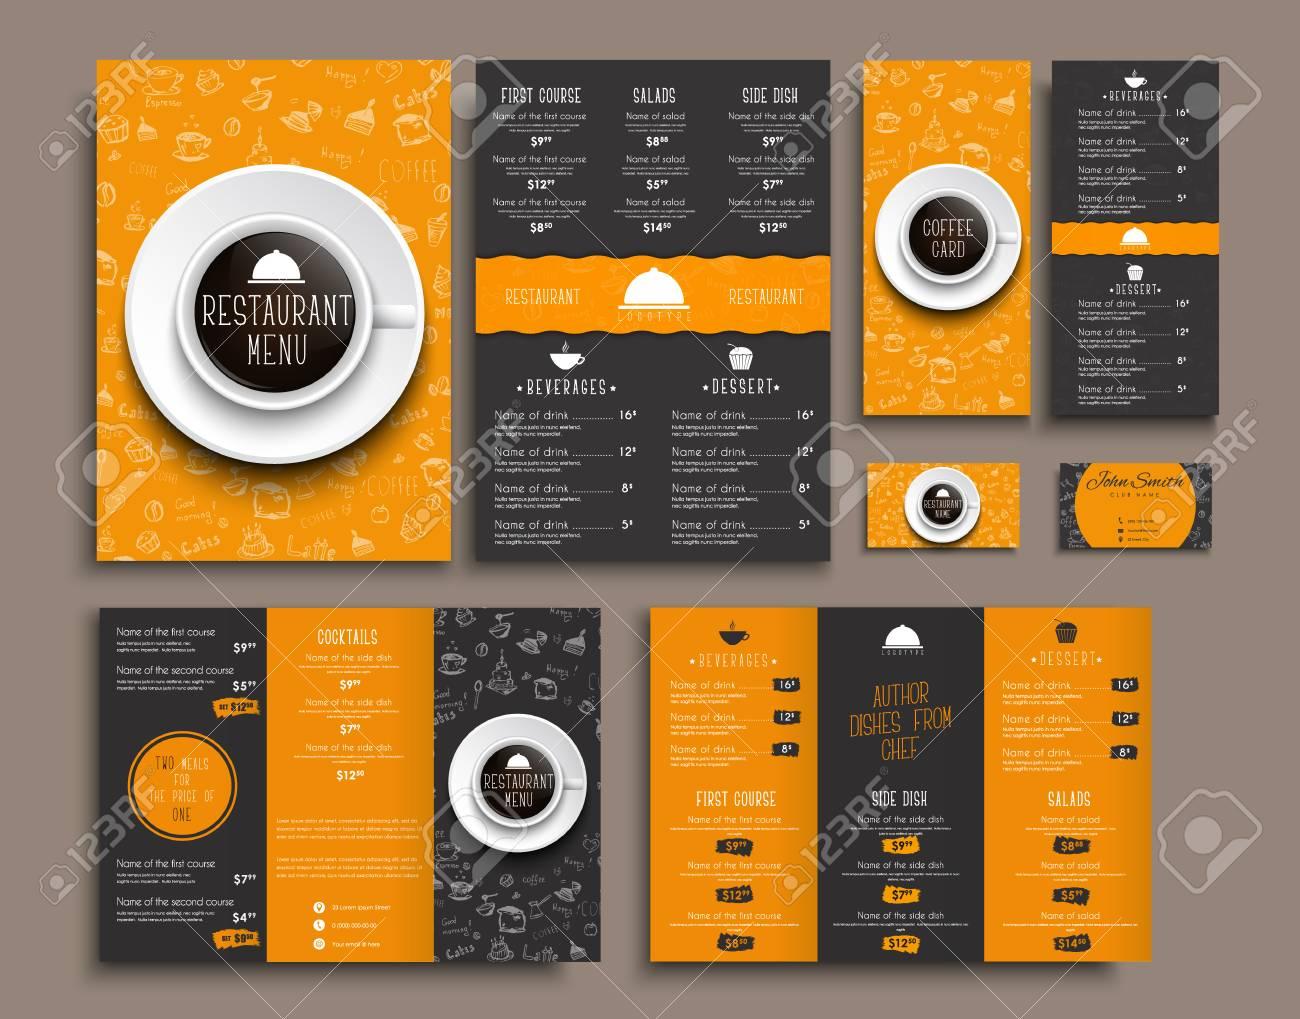 Templates business cards a4 menu folding brochures and flyers templates business cards a4 menu folding brochures and flyers narrow for a restaurant or colourmoves